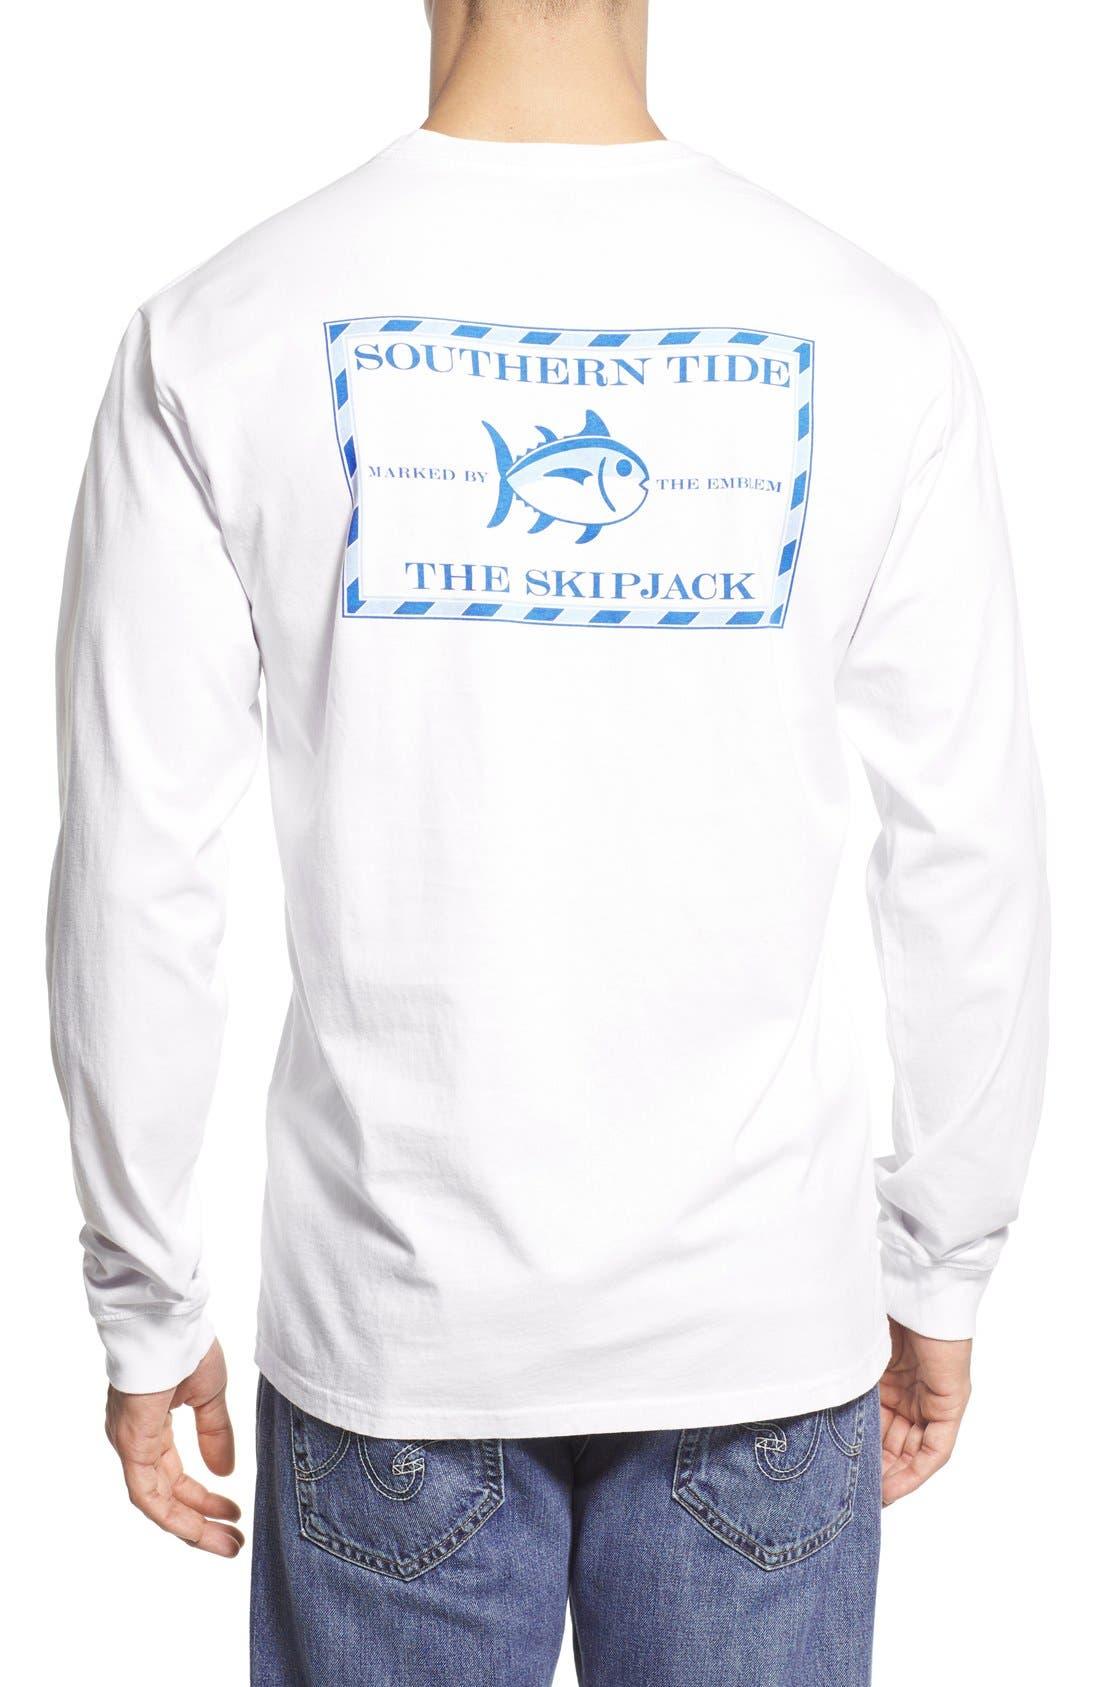 Main Image - Southern Tide 'Skipjack'Long Sleeve Graphic T-Shirt